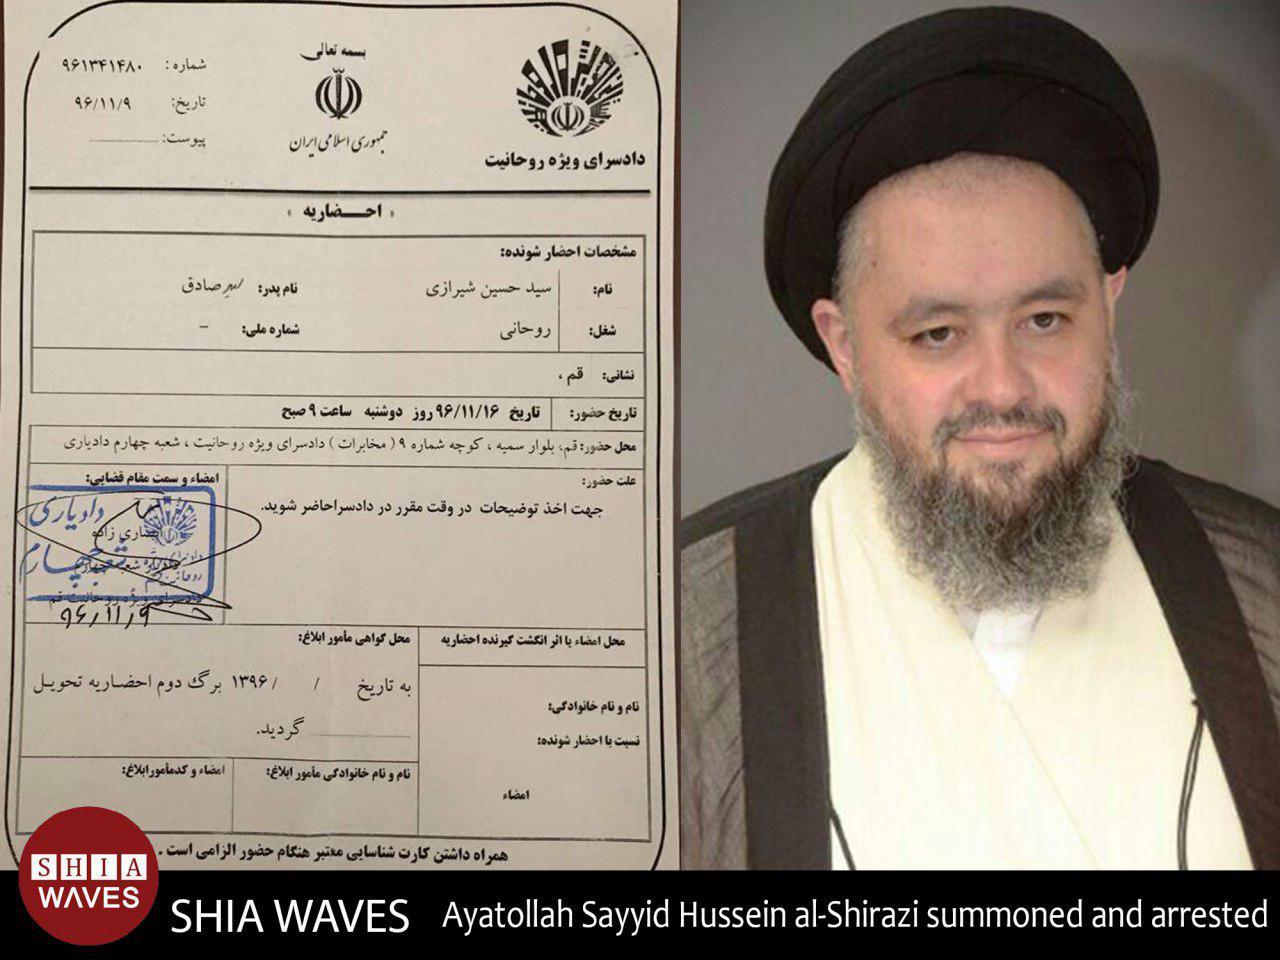 Photo of Ayatollah Sayyid Hussein al-Shirazi summoned and arrested by Iranian intelligence